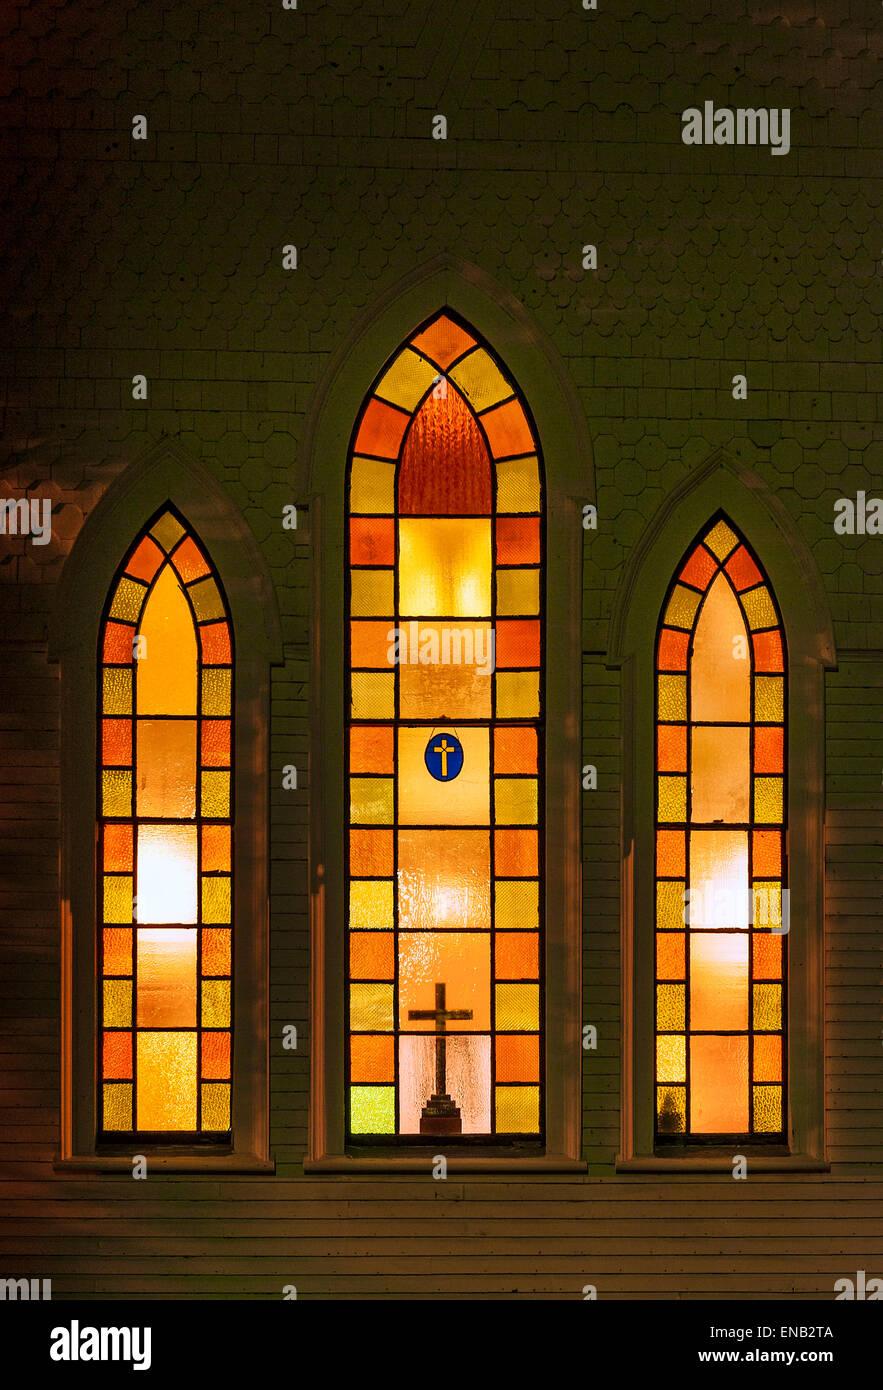 Windows iglesia iluminada por la noche. Imagen De Stock